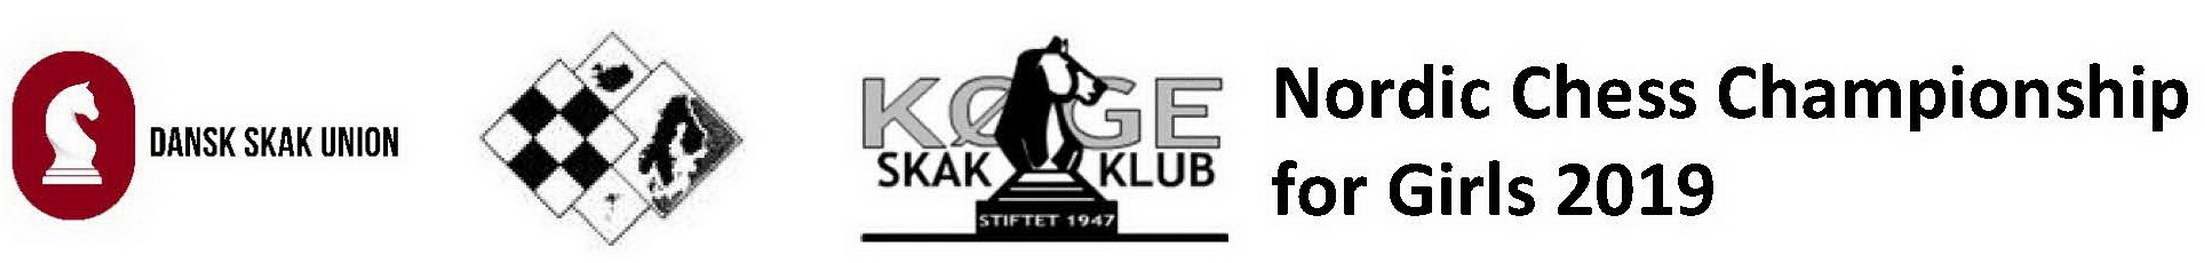 NCCG2019 logo